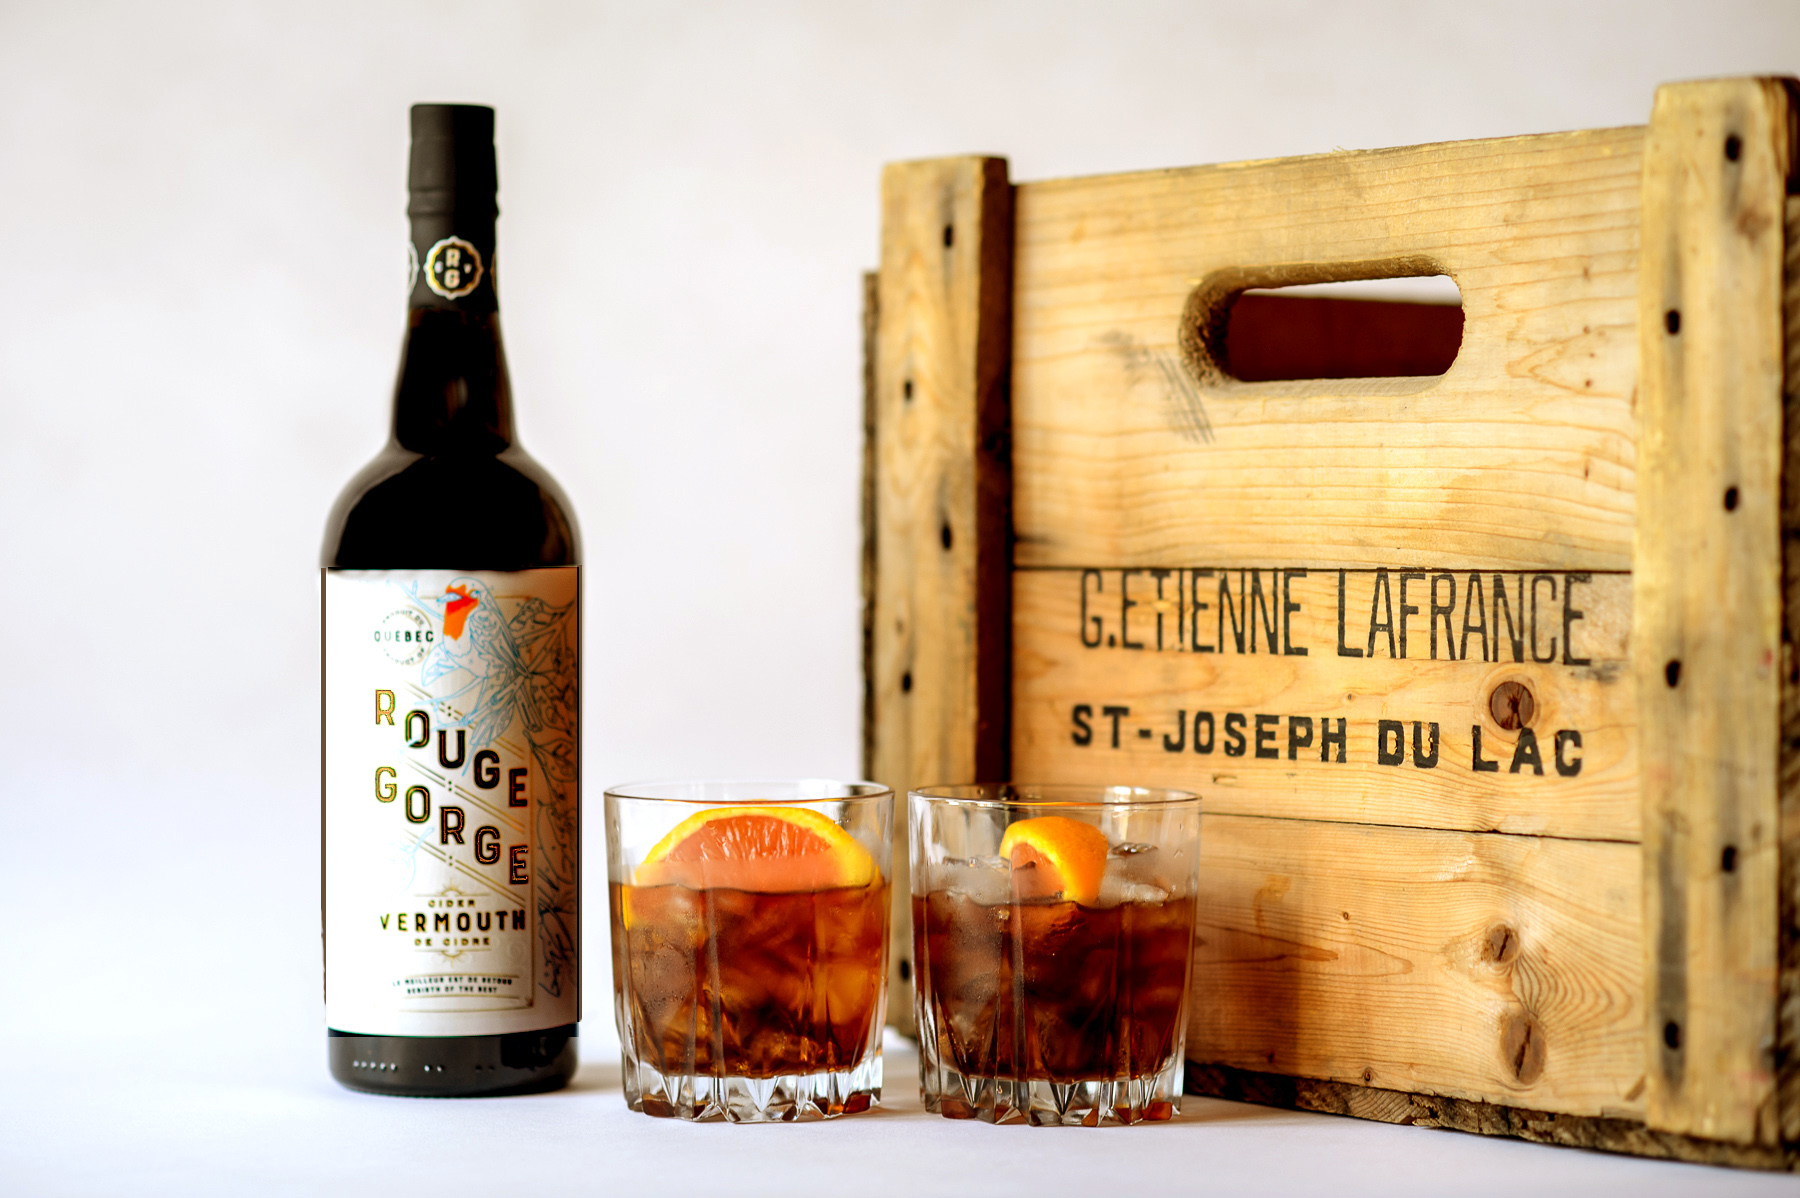 domainelafrance_vermouth_rougegorge_querelles